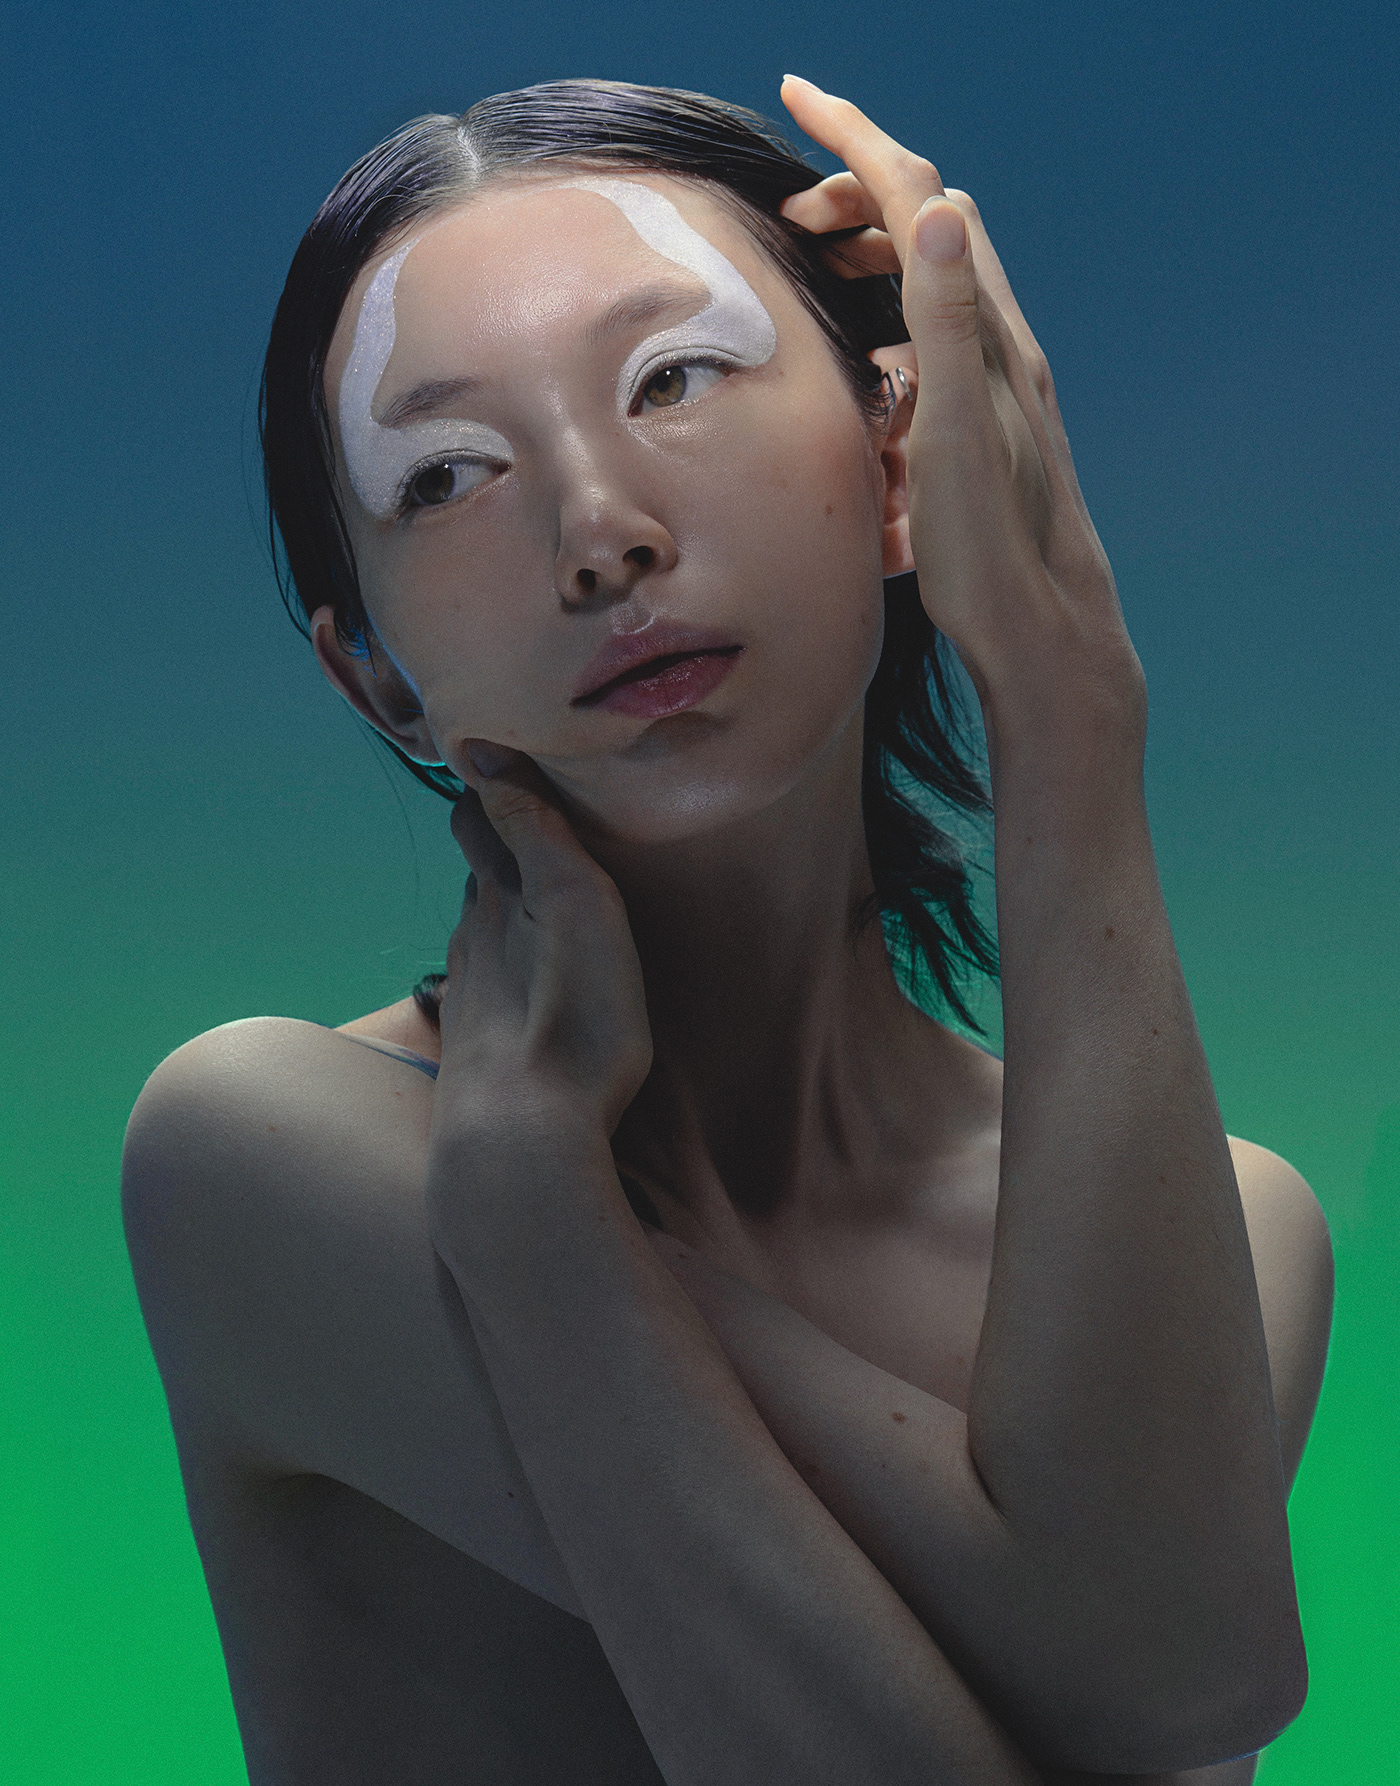 Image may contain: person, woman and screenshot